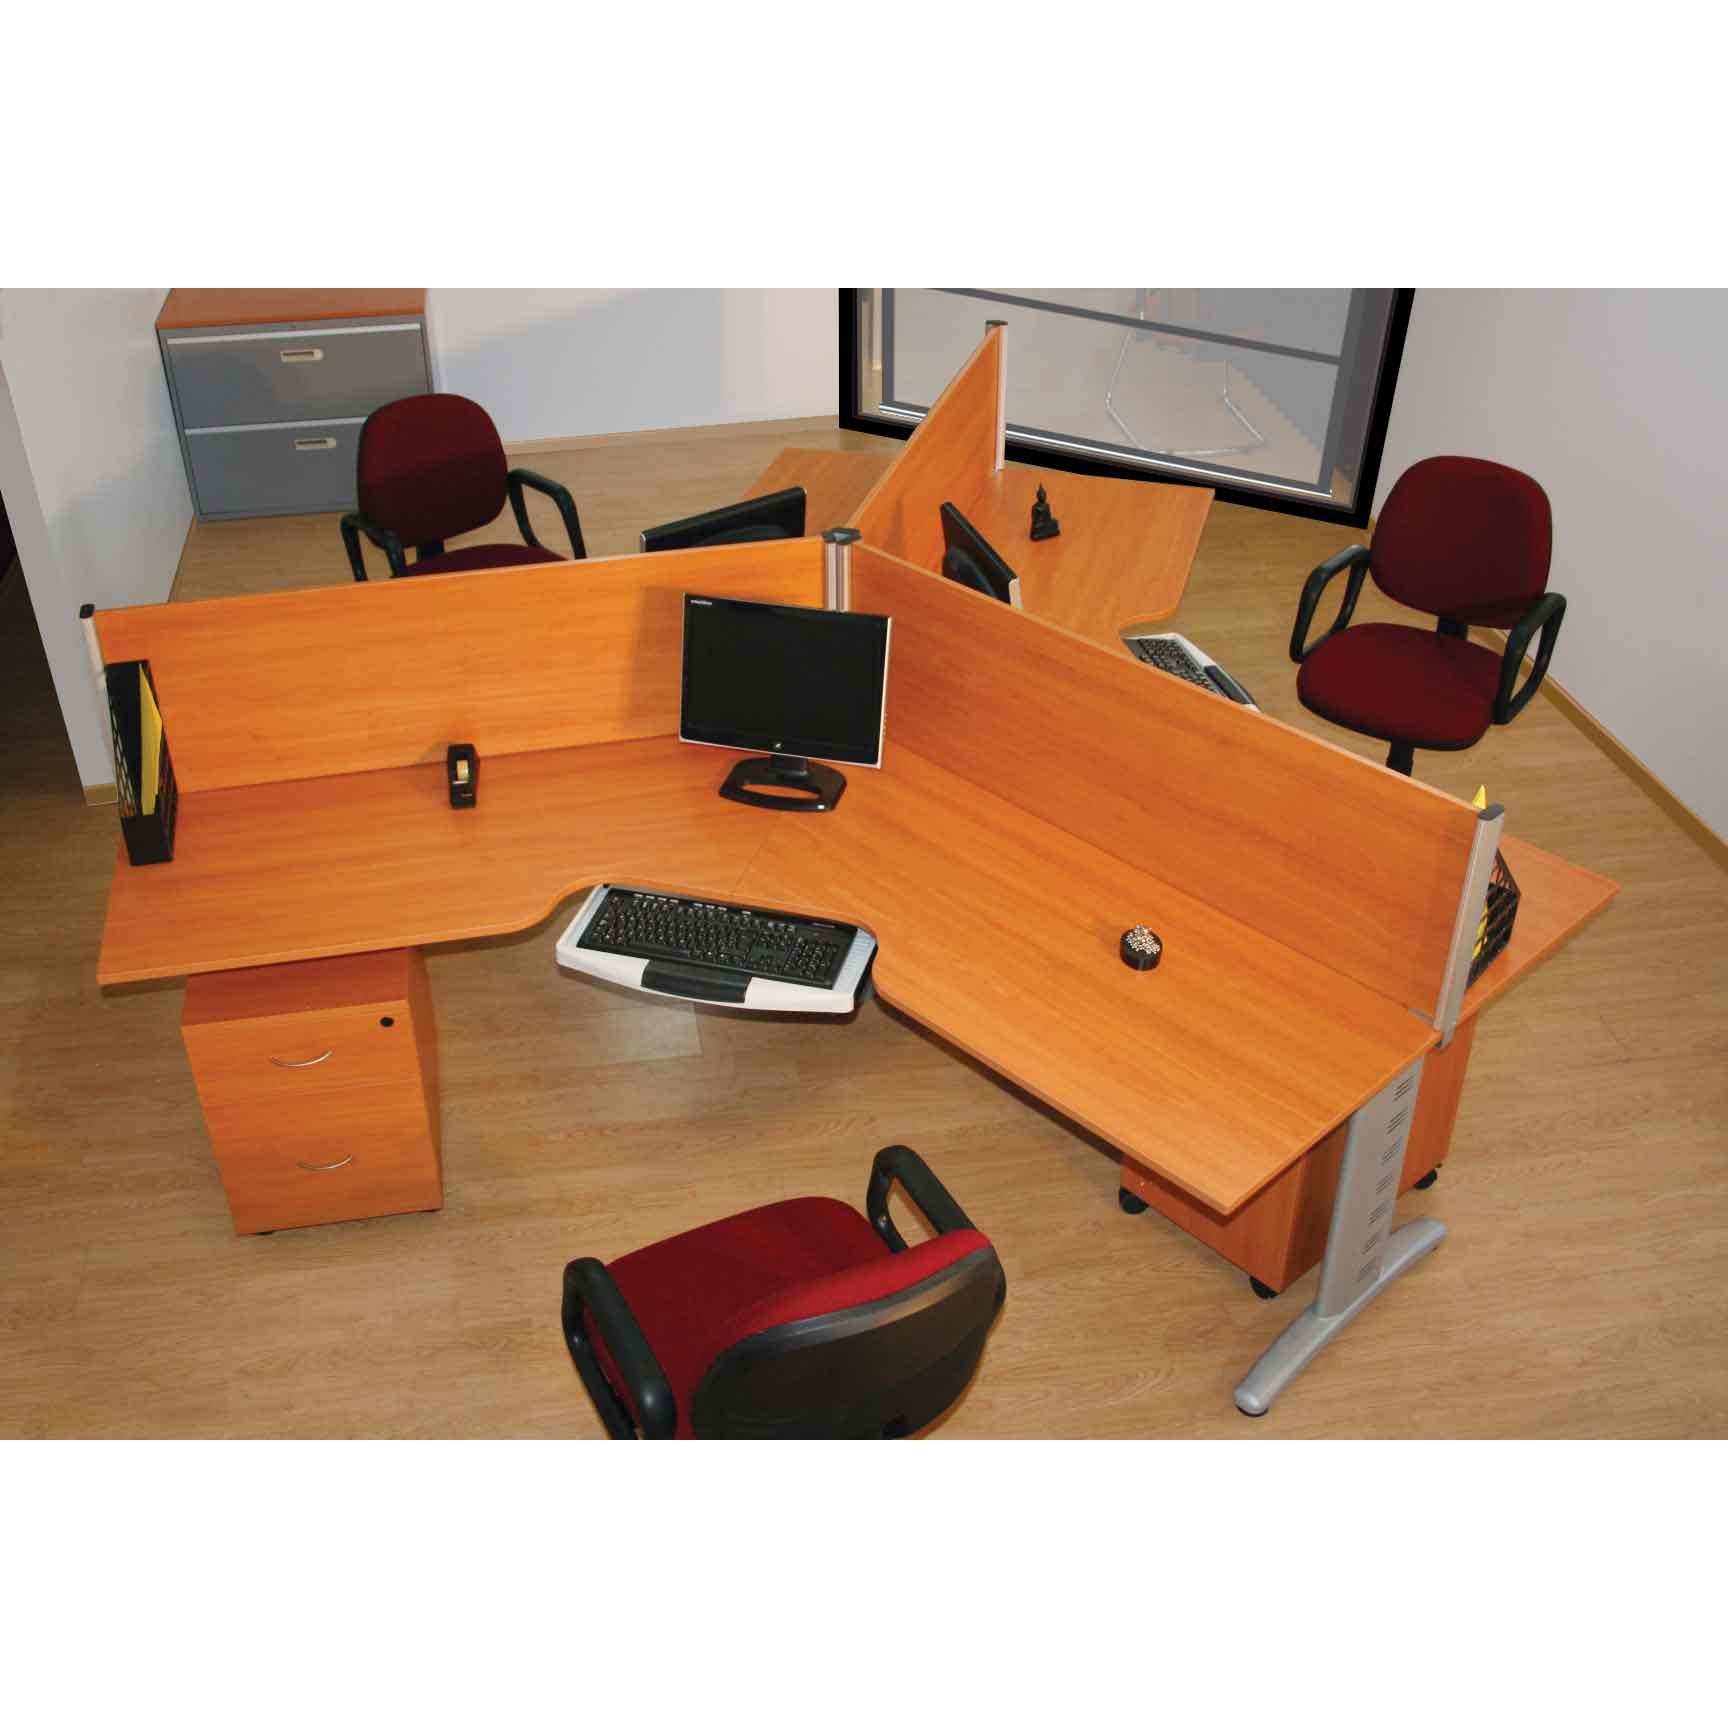 Triceta operativa miami grupo meta soluciones de limpieza muebles y oficina for Muebles de oficina outlet